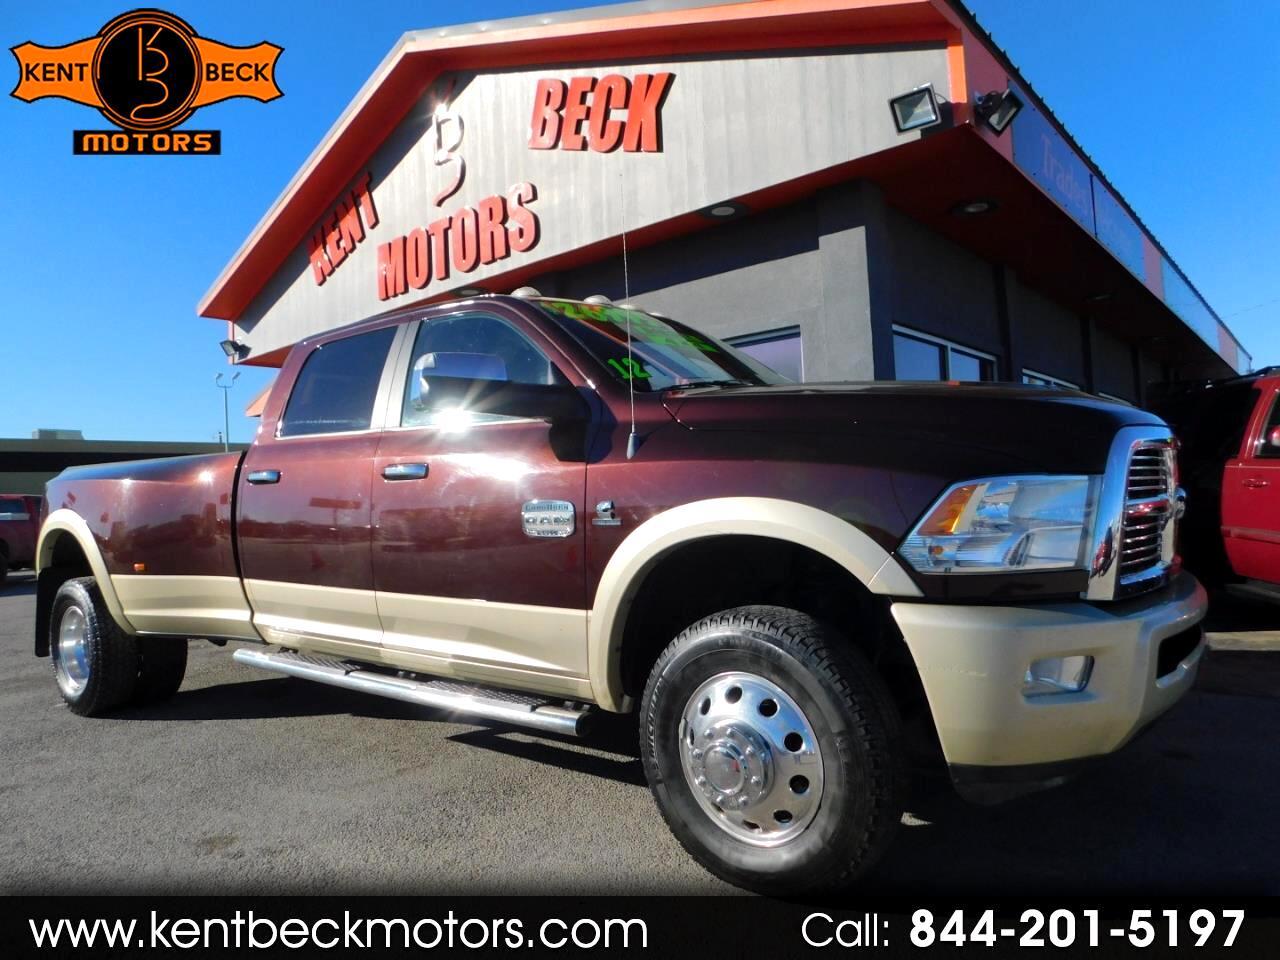 2012 RAM 3500 Laramie Longhorn Edition Crew Cab LWB 4WD DRW